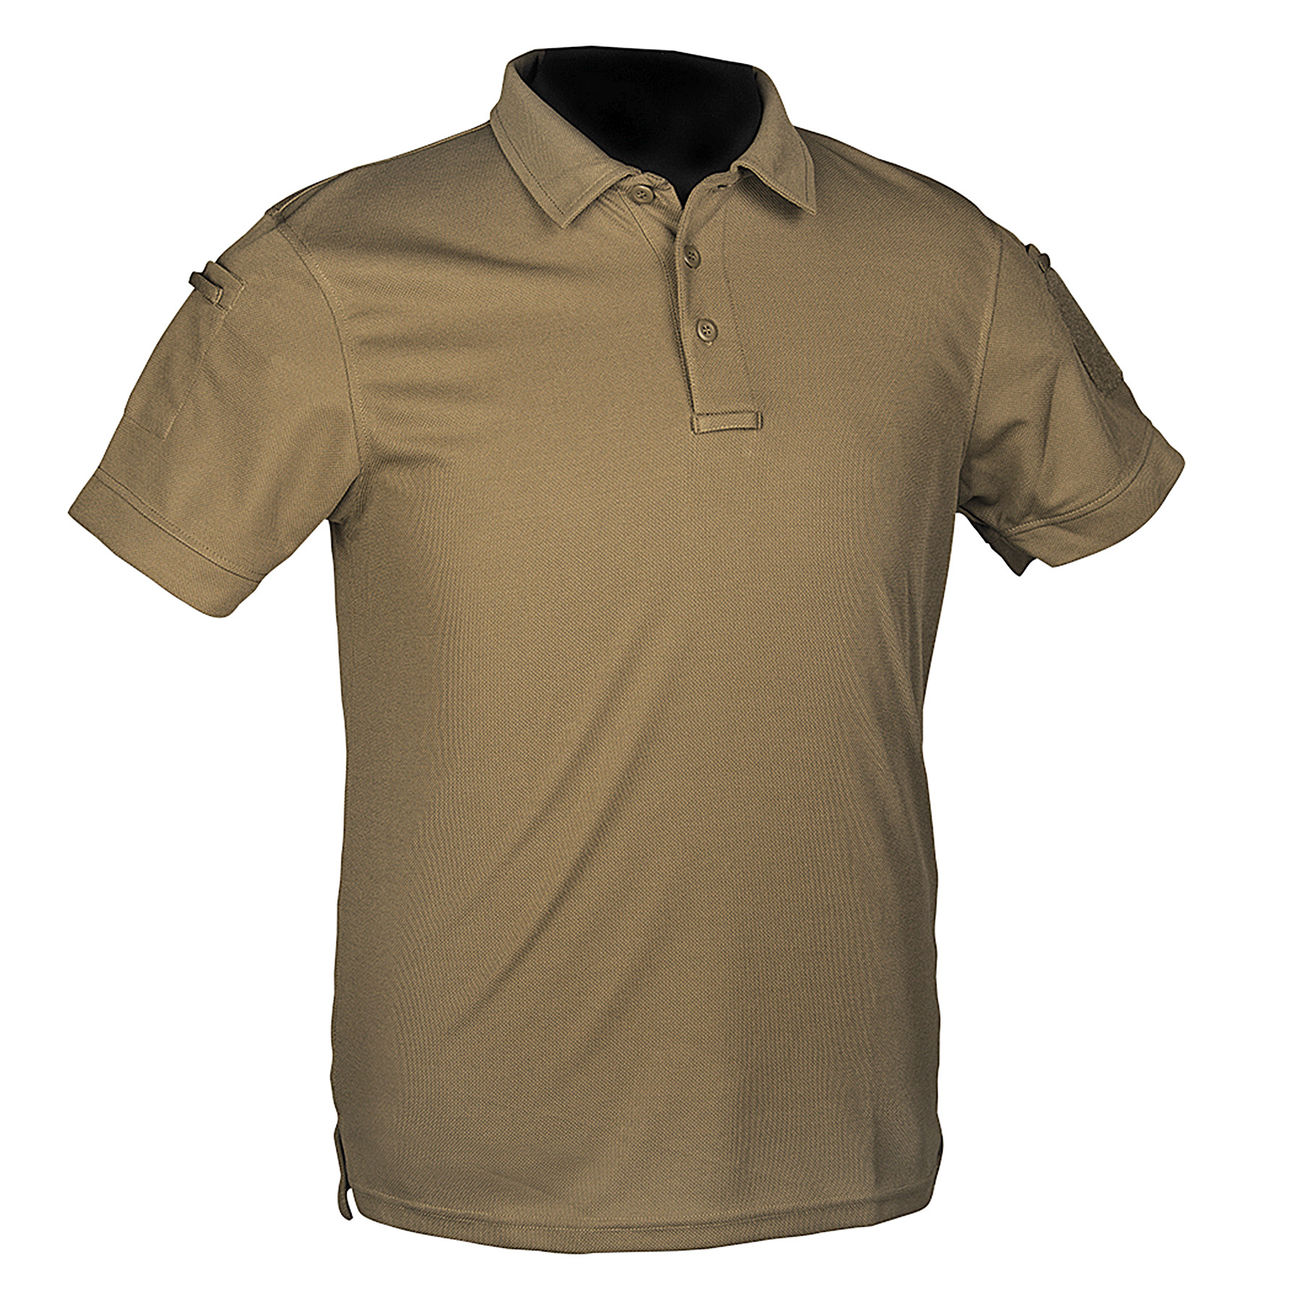 ba36ac7164352 Mil-Tec Poloshirt Tactical Quick Dry dark coyote günstig kaufen ...